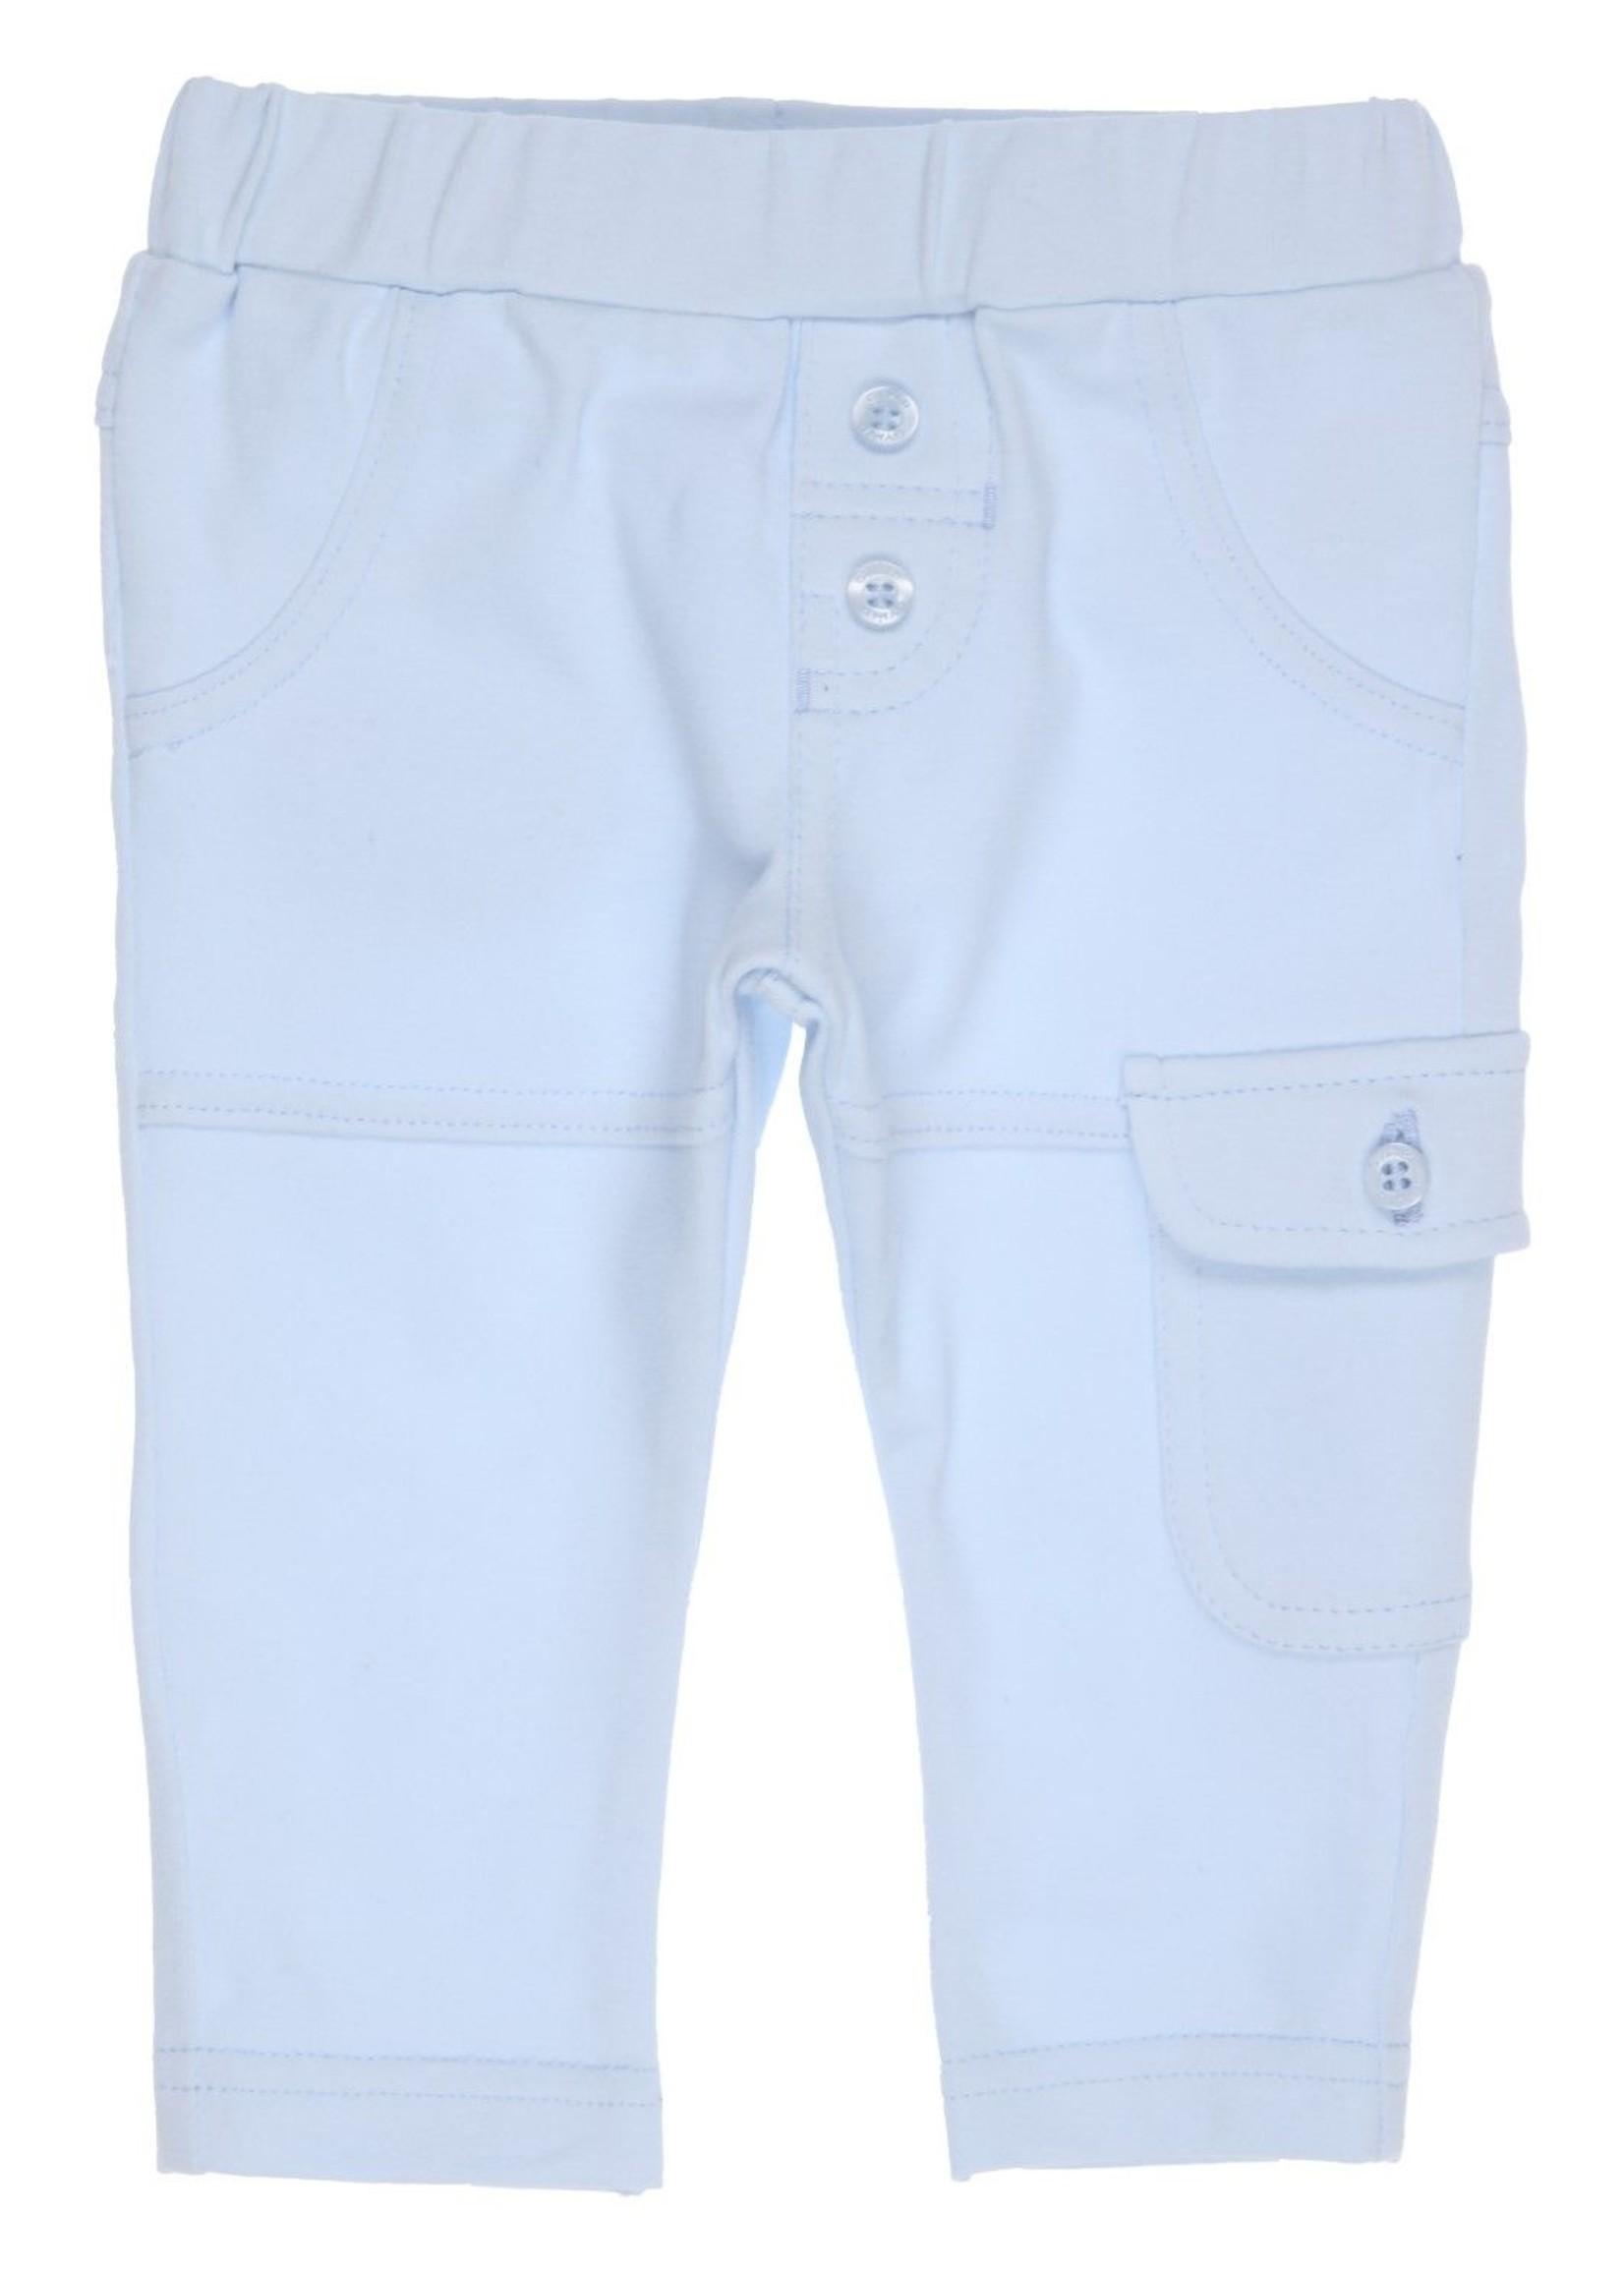 Gymp Gymp pants side pocket lichtblauw